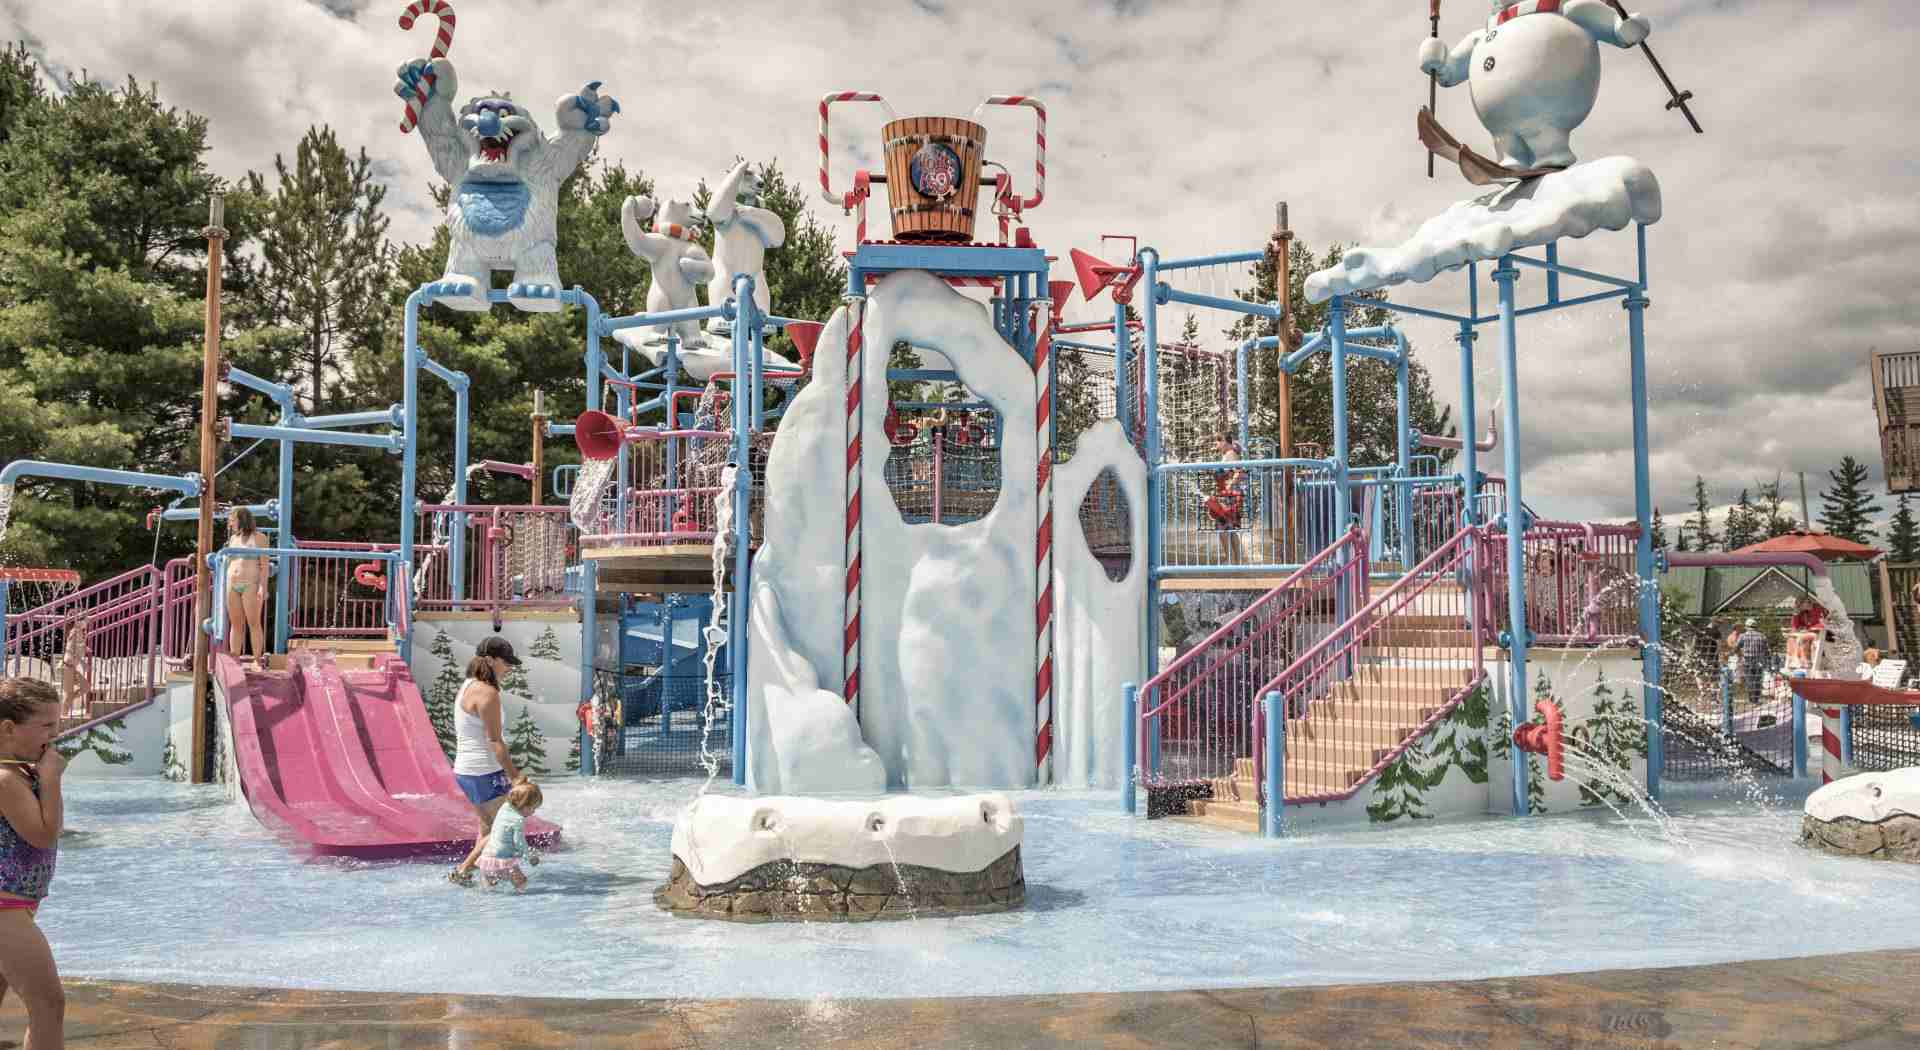 Santa's Village water play area